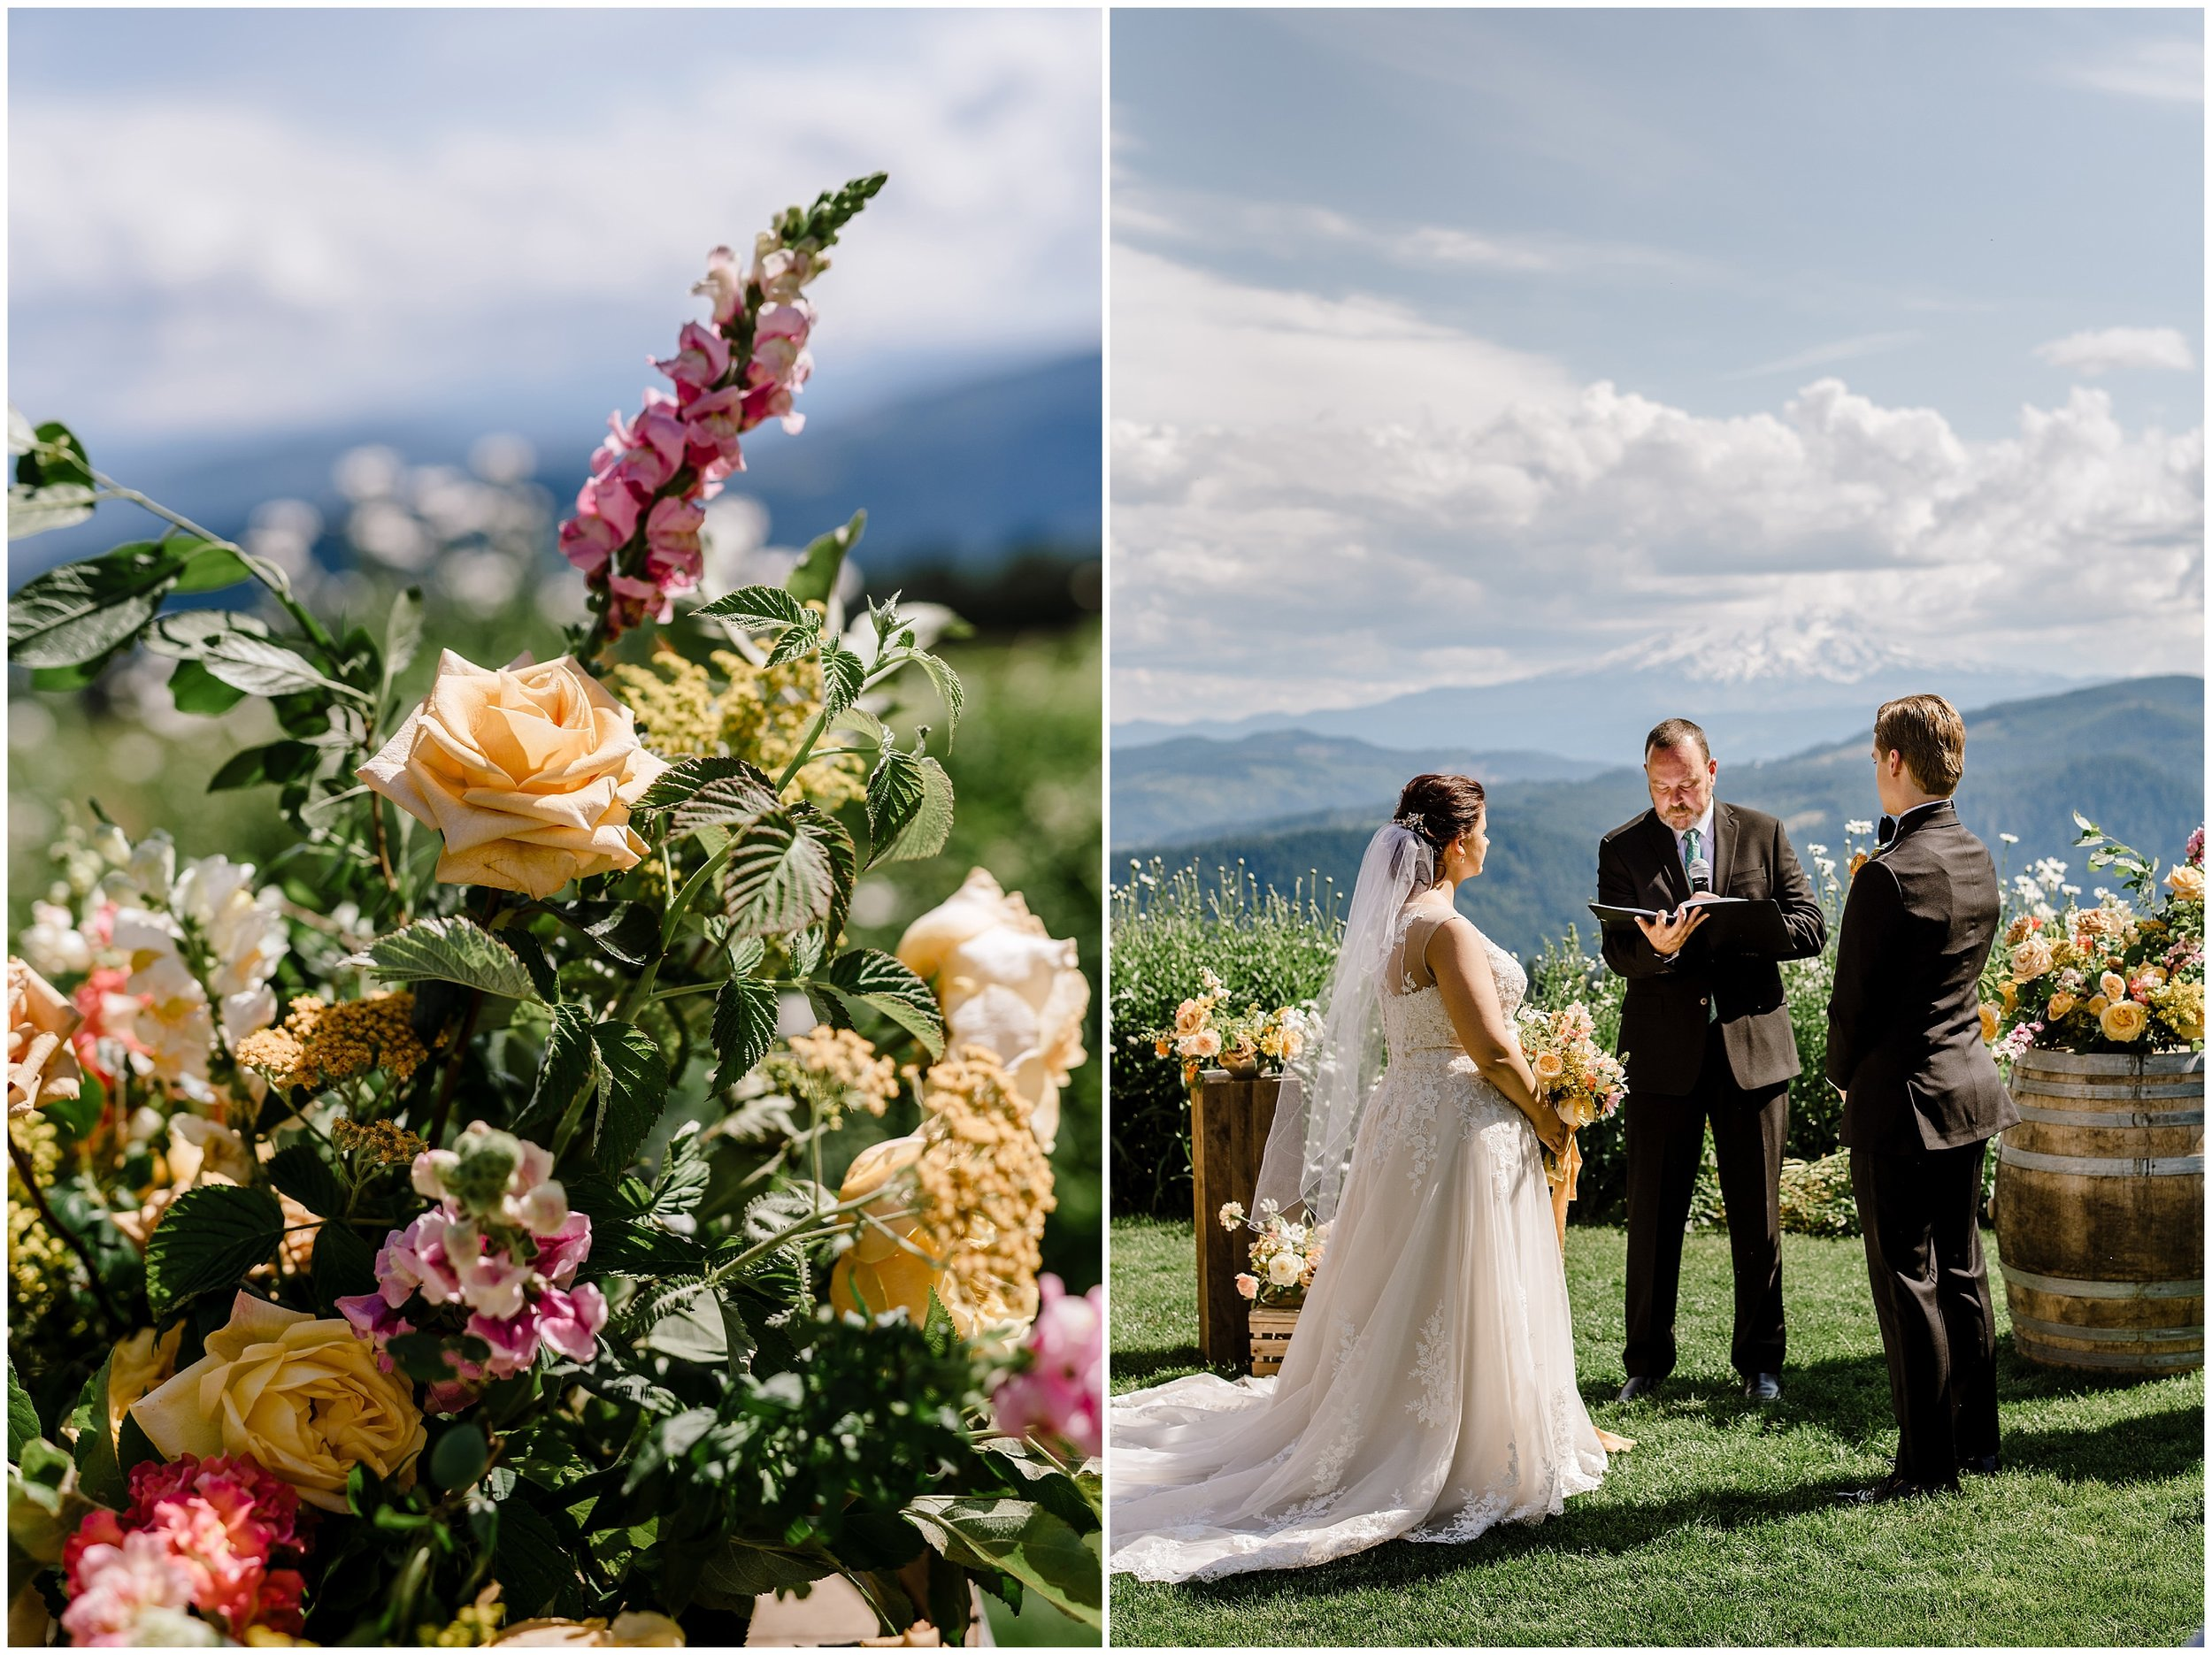 Citrus-inspired-wedding-at-Gorge-Crest-Vineyard-214.jpg